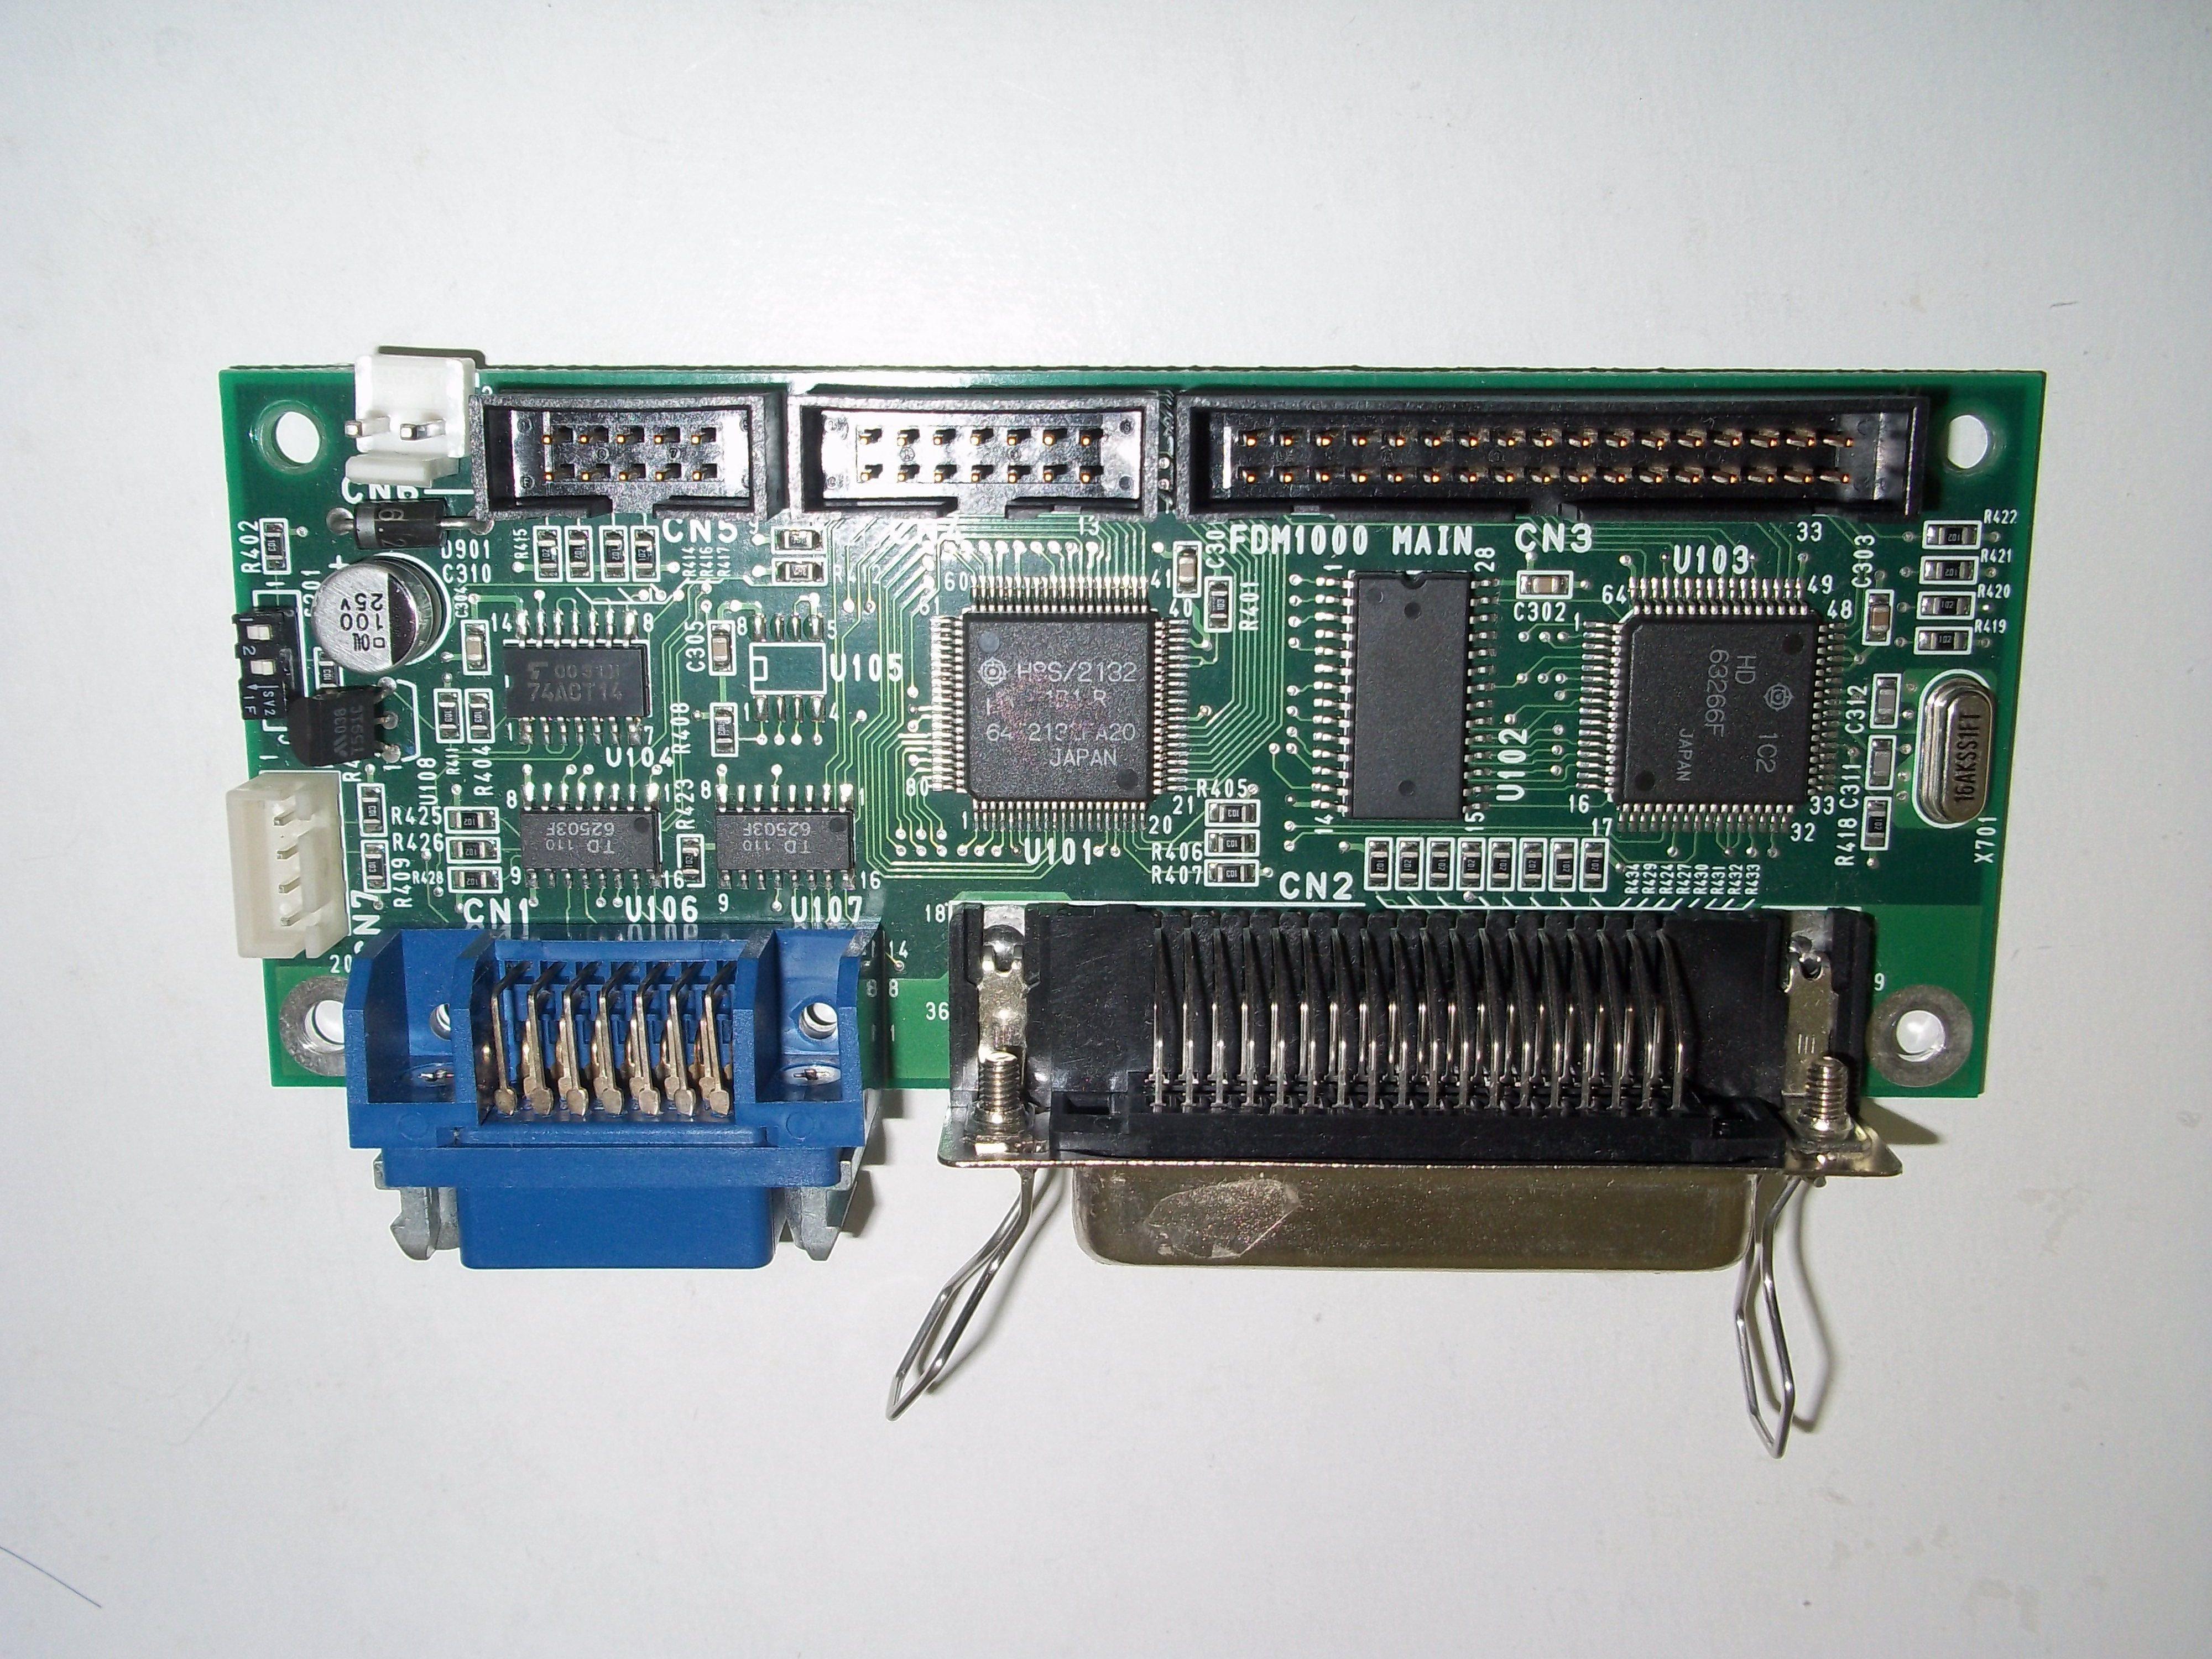 Repair FDM-1000 MAIN CARD MEIDENSHA CONTROLLER in Malaysia, Singapore, Thailand, Indonesia